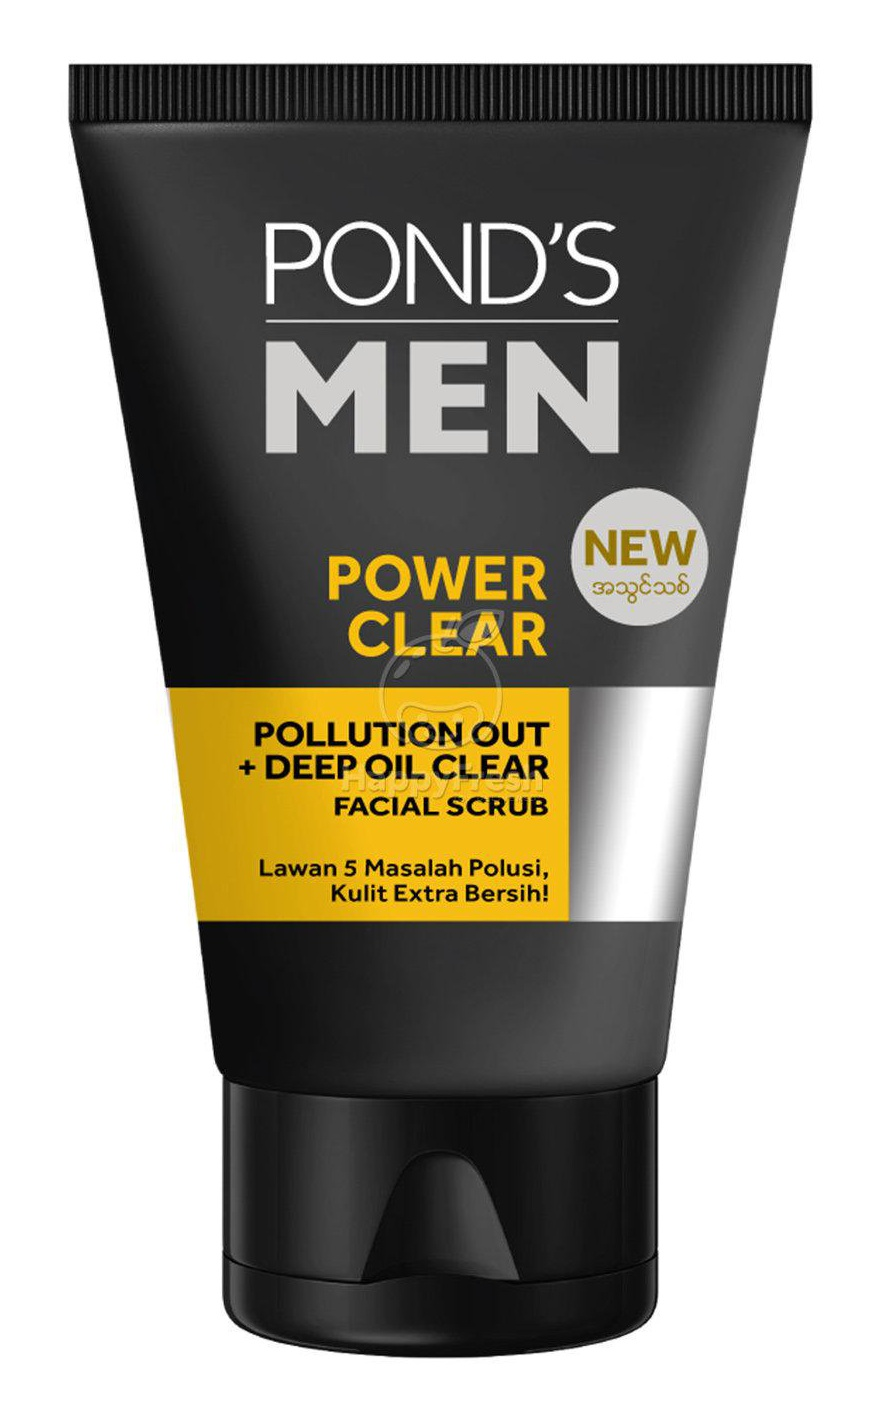 Pond's Men Power Clear Pollution Out + Deep Oil Clear Facial Scrub